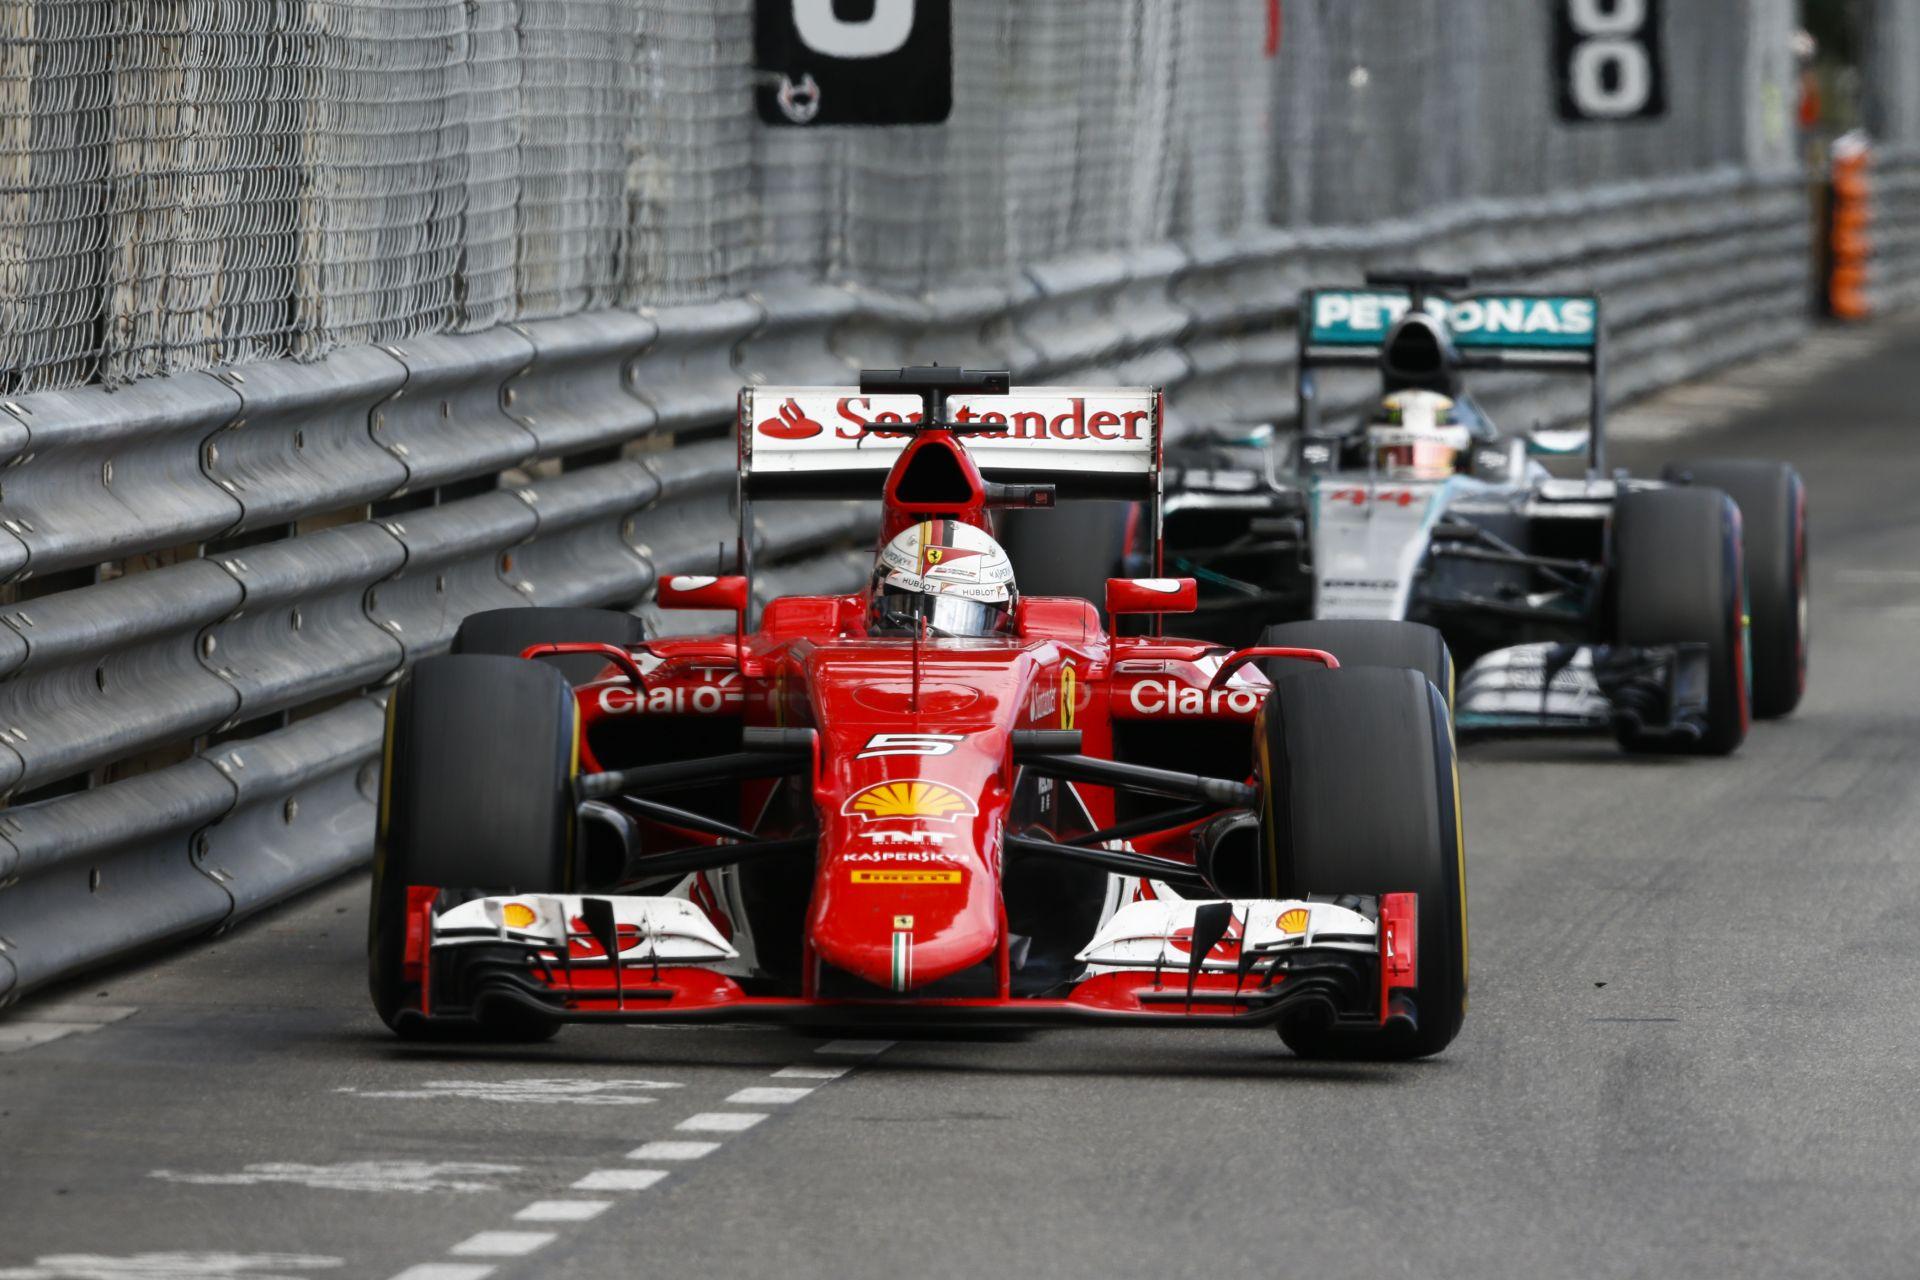 Ferrari Vs. Mercedes Vs. Honda Vs. Manor: hangpárbaj a 2016-os F1-es motorok között